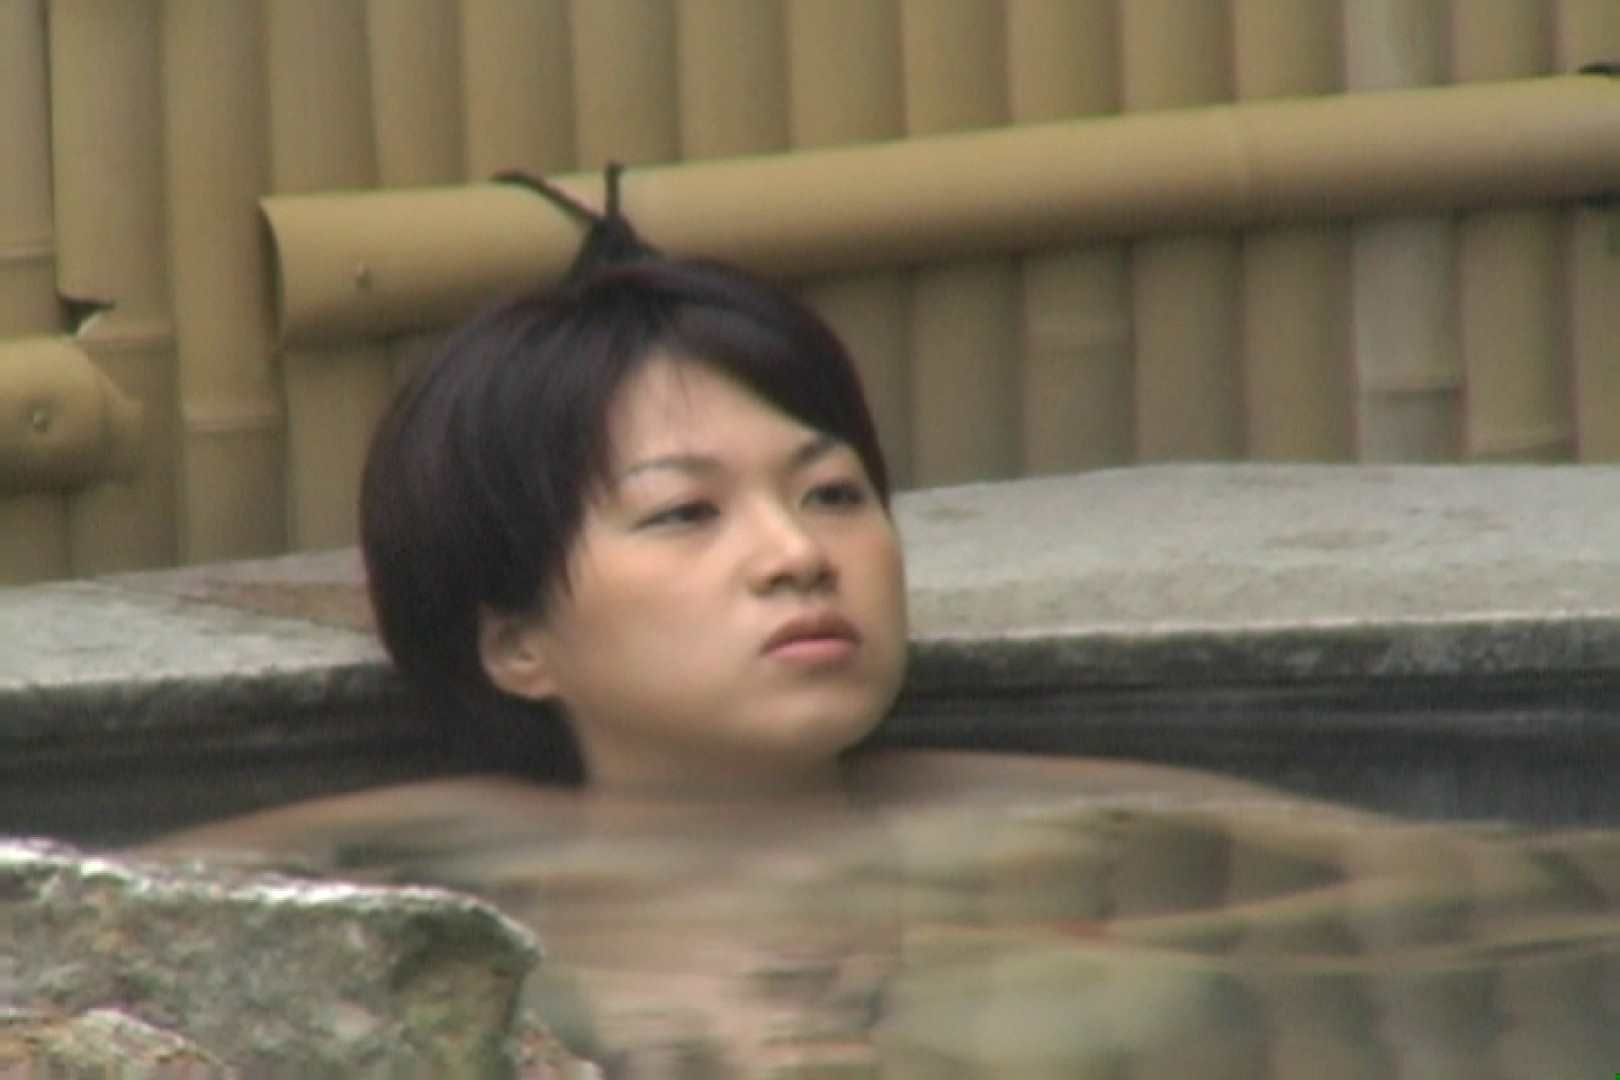 Aquaな露天風呂Vol.624 露天   OLセックス  52画像 22